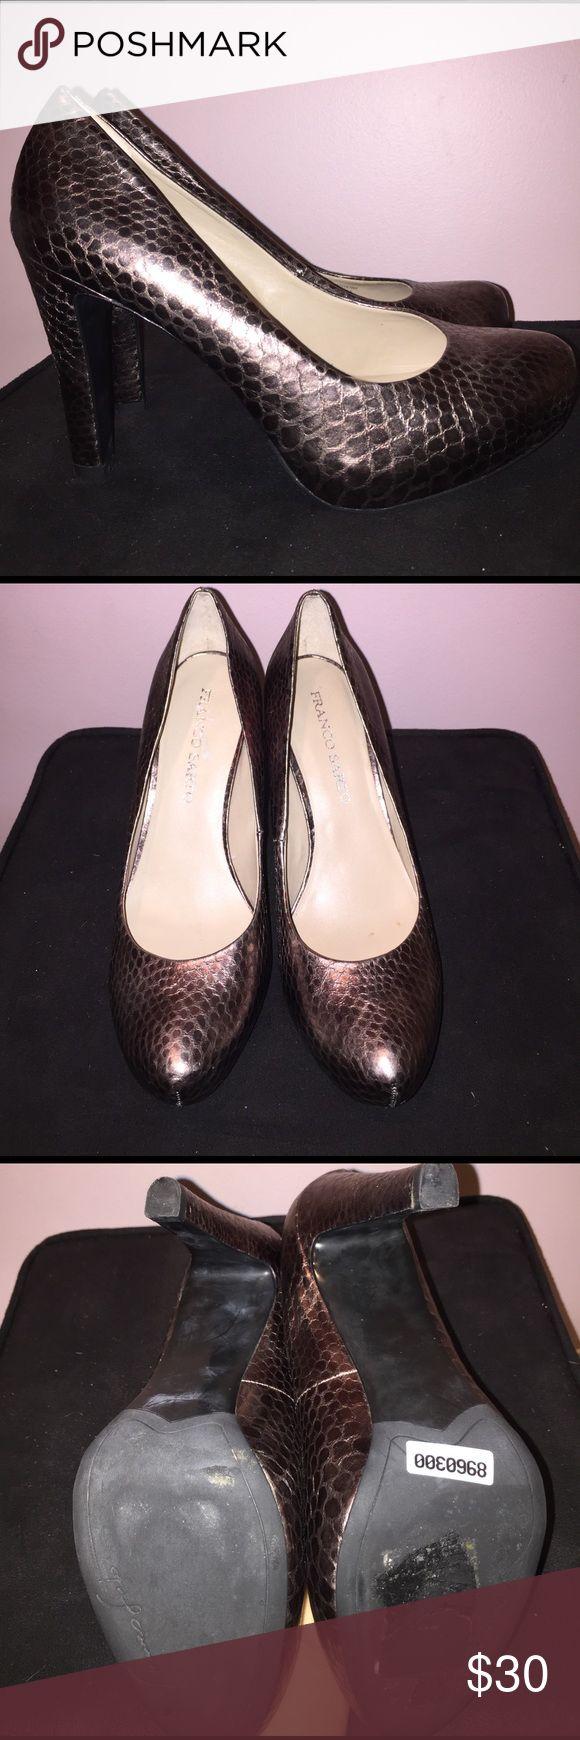 Franco Sarto Snakeskin Heels Franco Sarto Snakeskin Heels. Gorgeous bronze color! Franco Sarto Shoes Heels